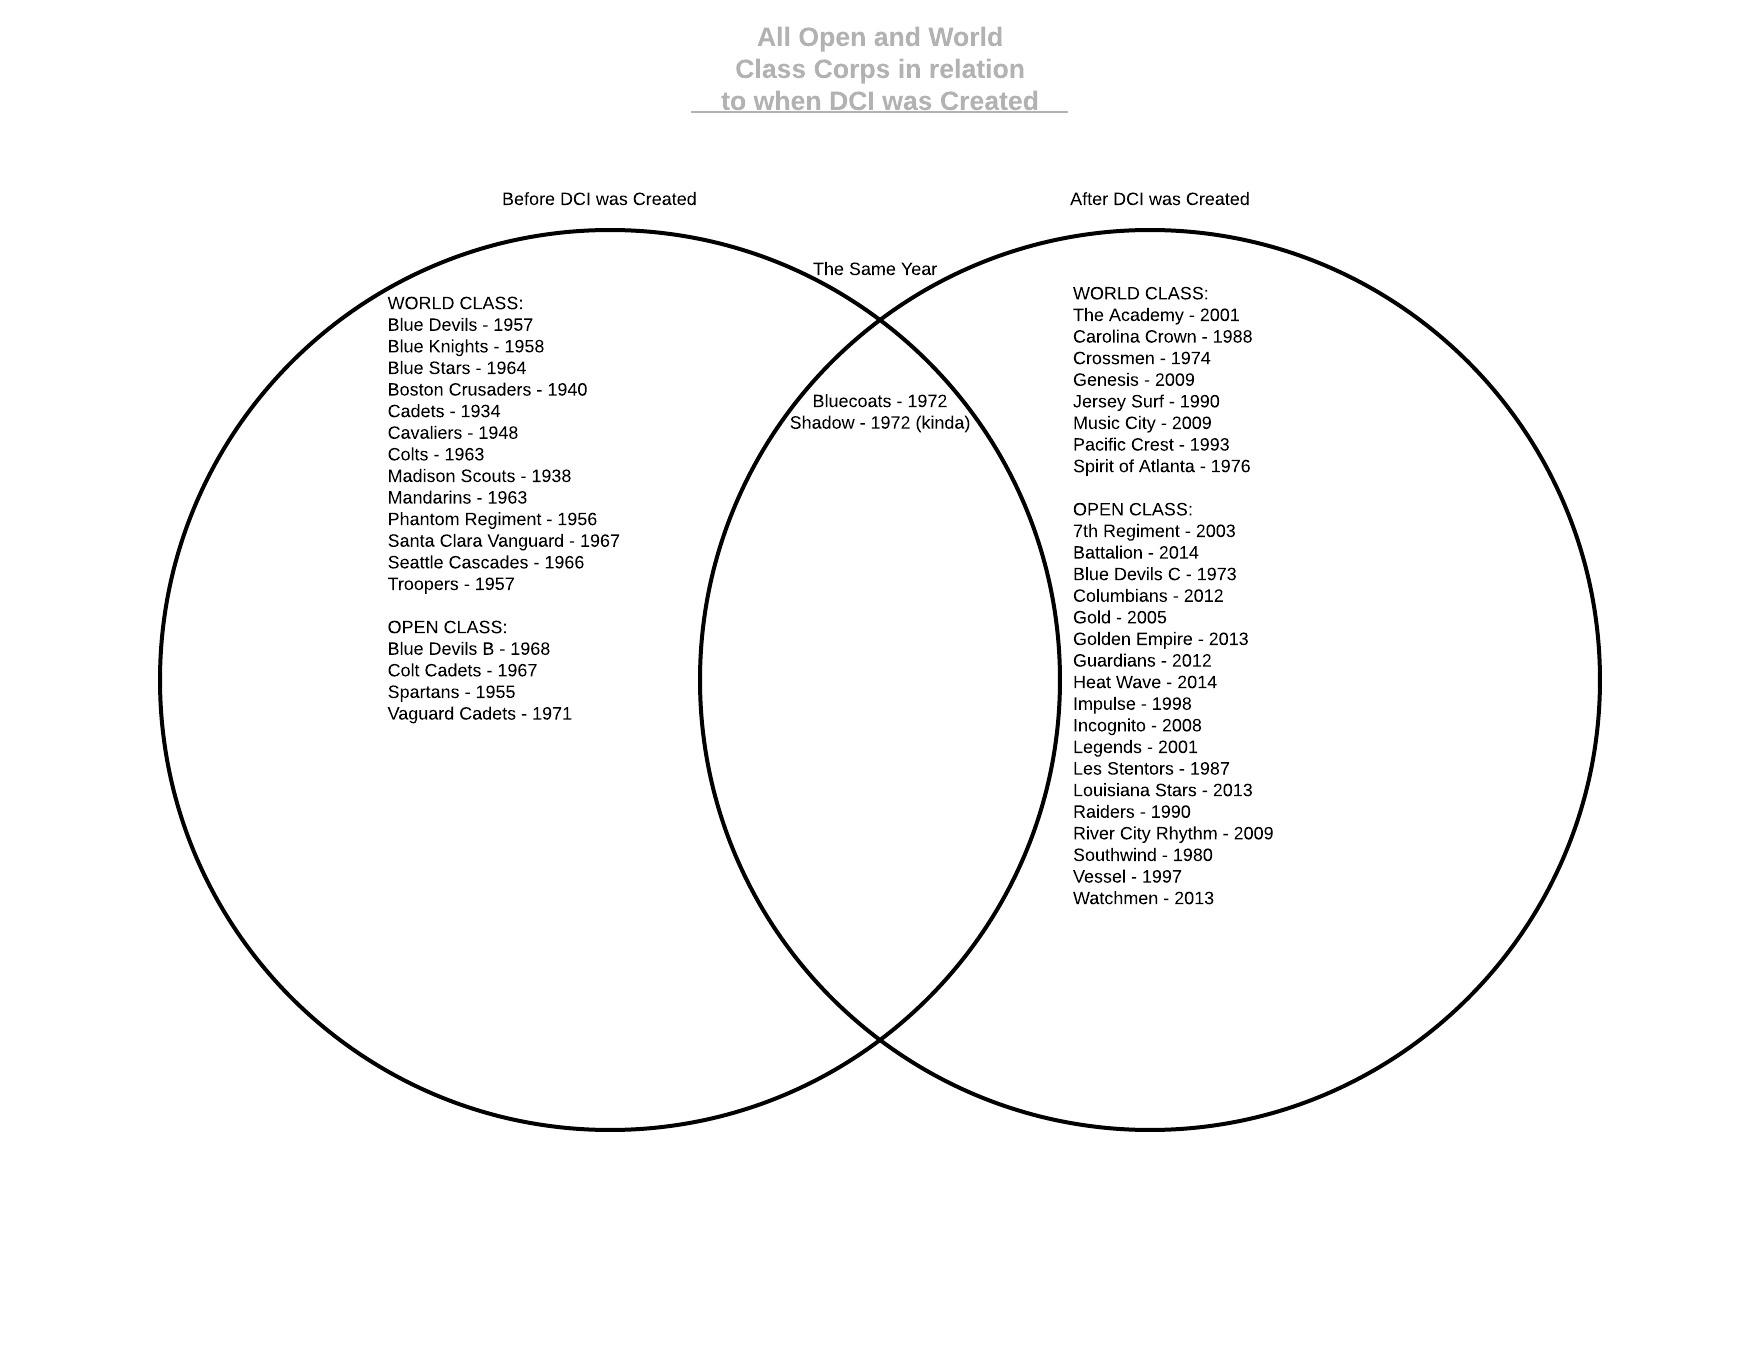 Here S A Random Venn Diagram I Made Of When Each Active